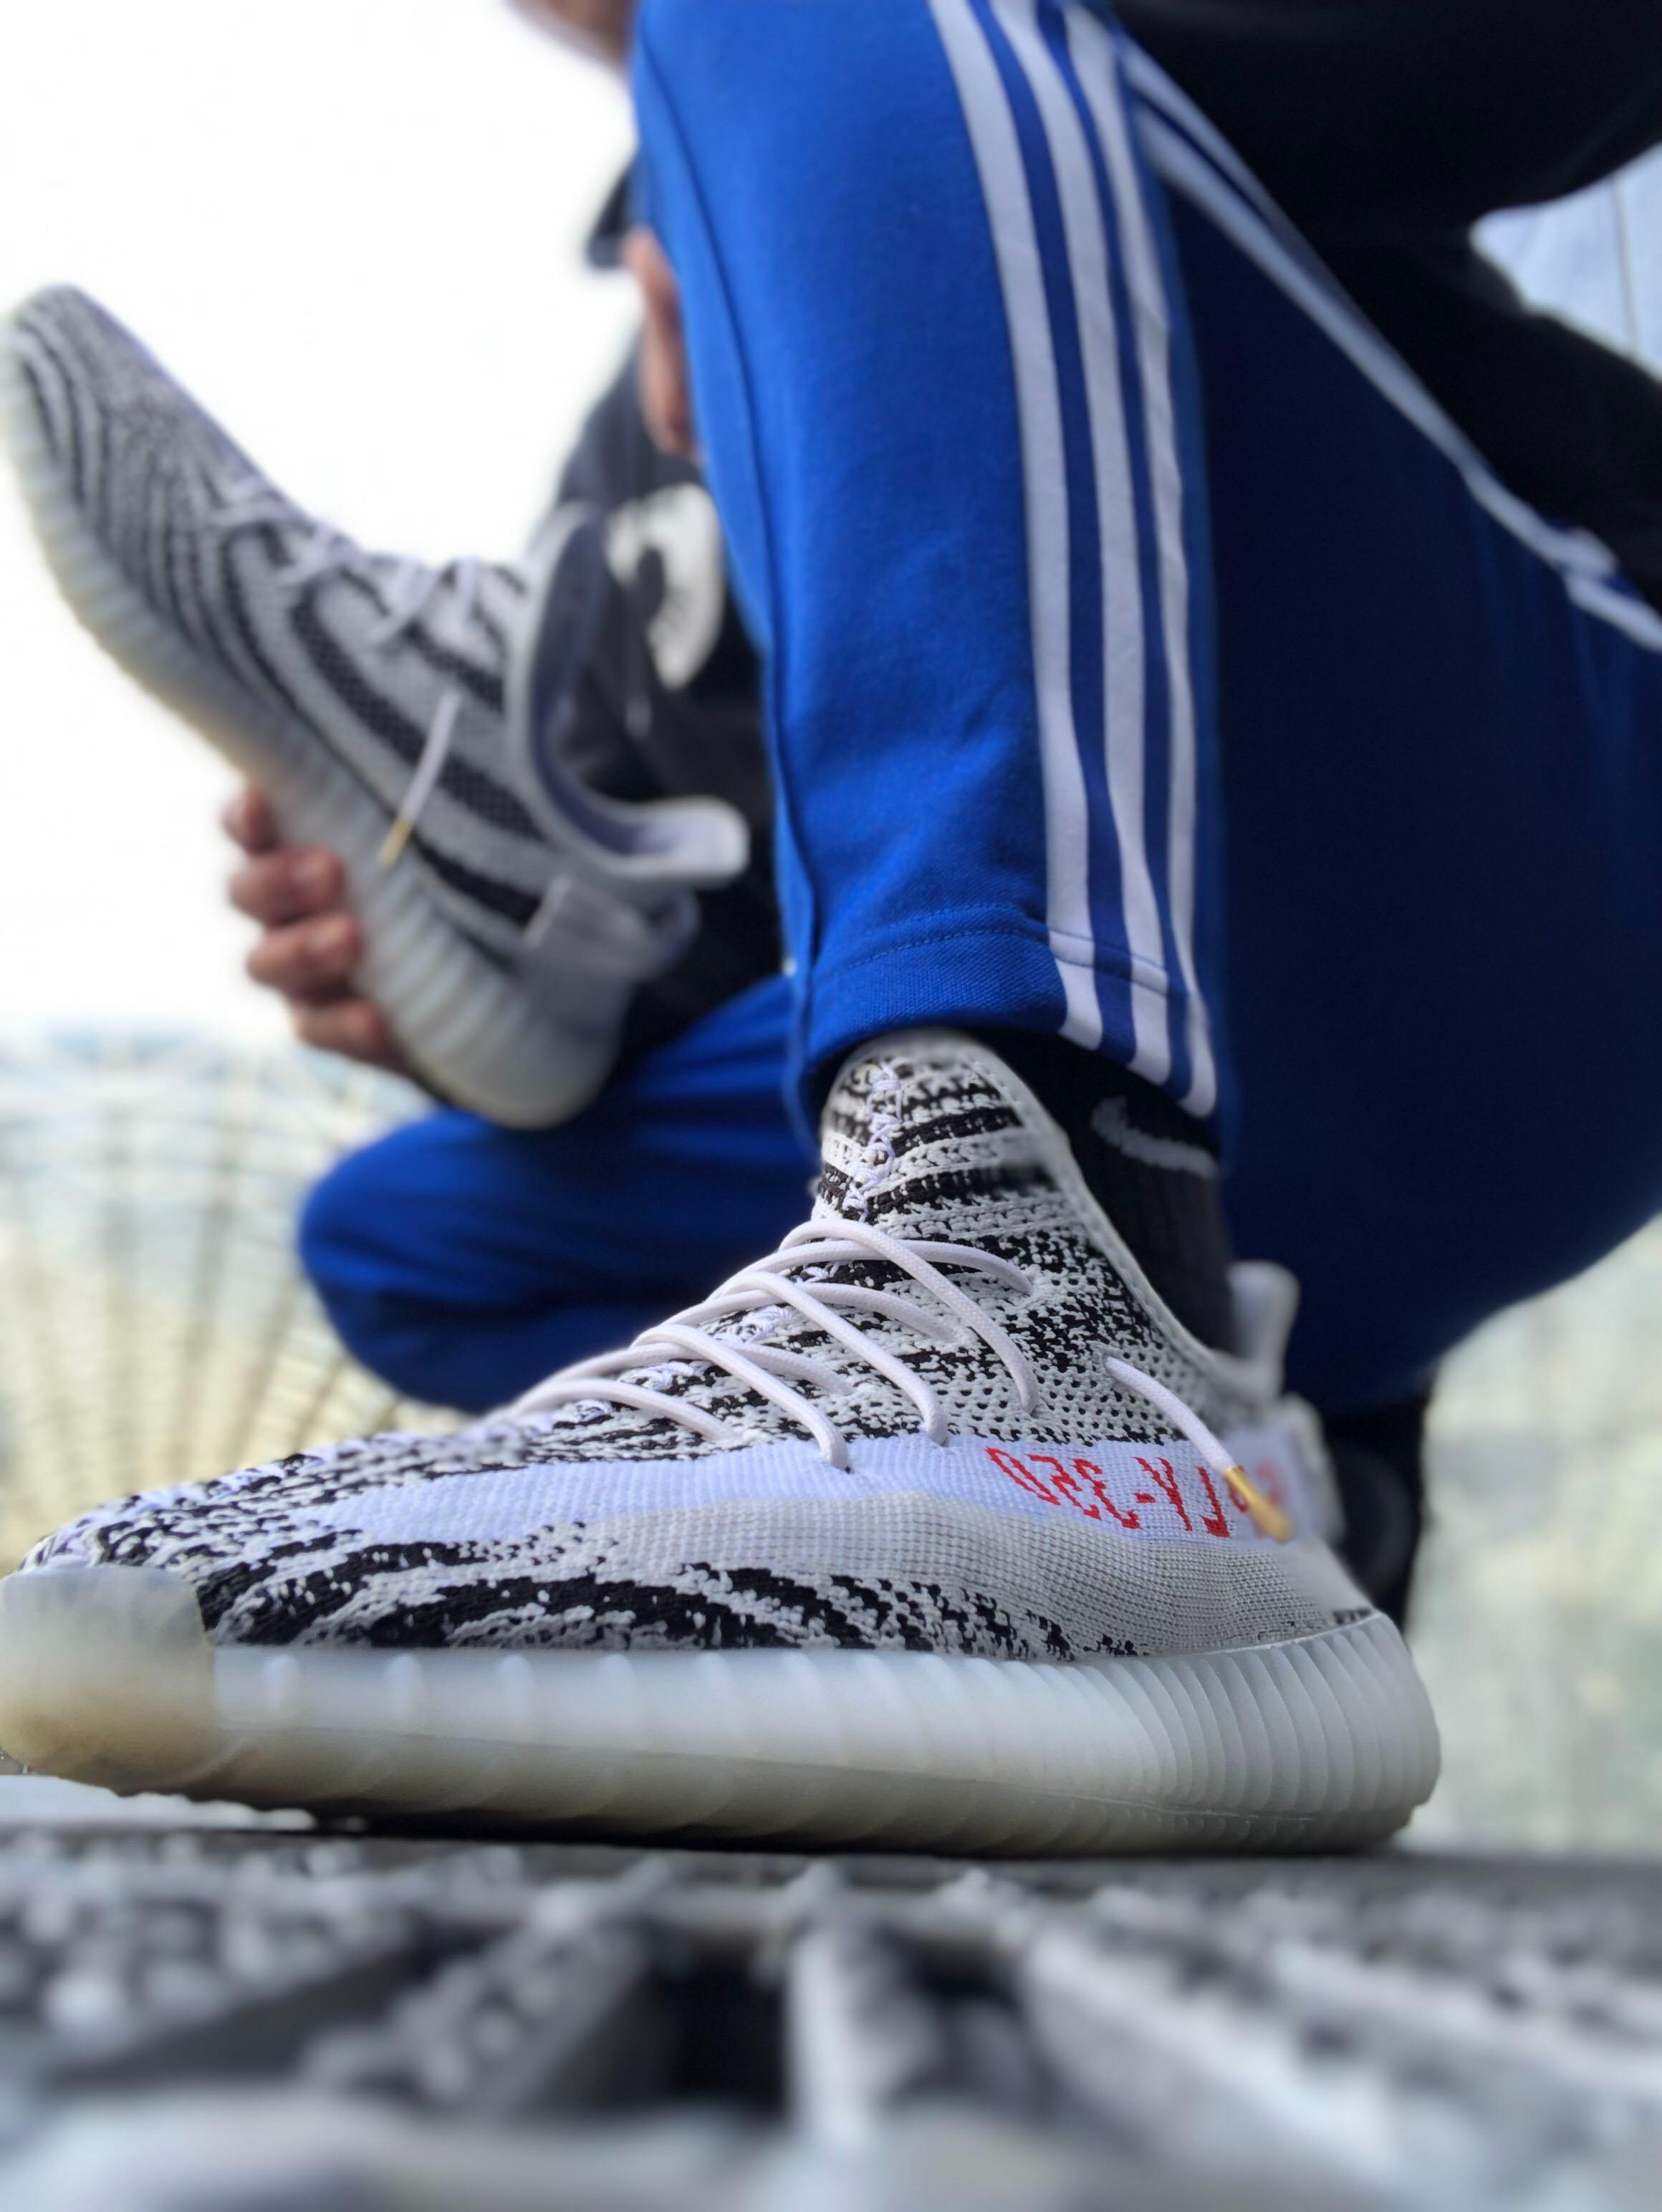 #adidas #yeezyboost350v2  紐をアレンジしたよ❤️